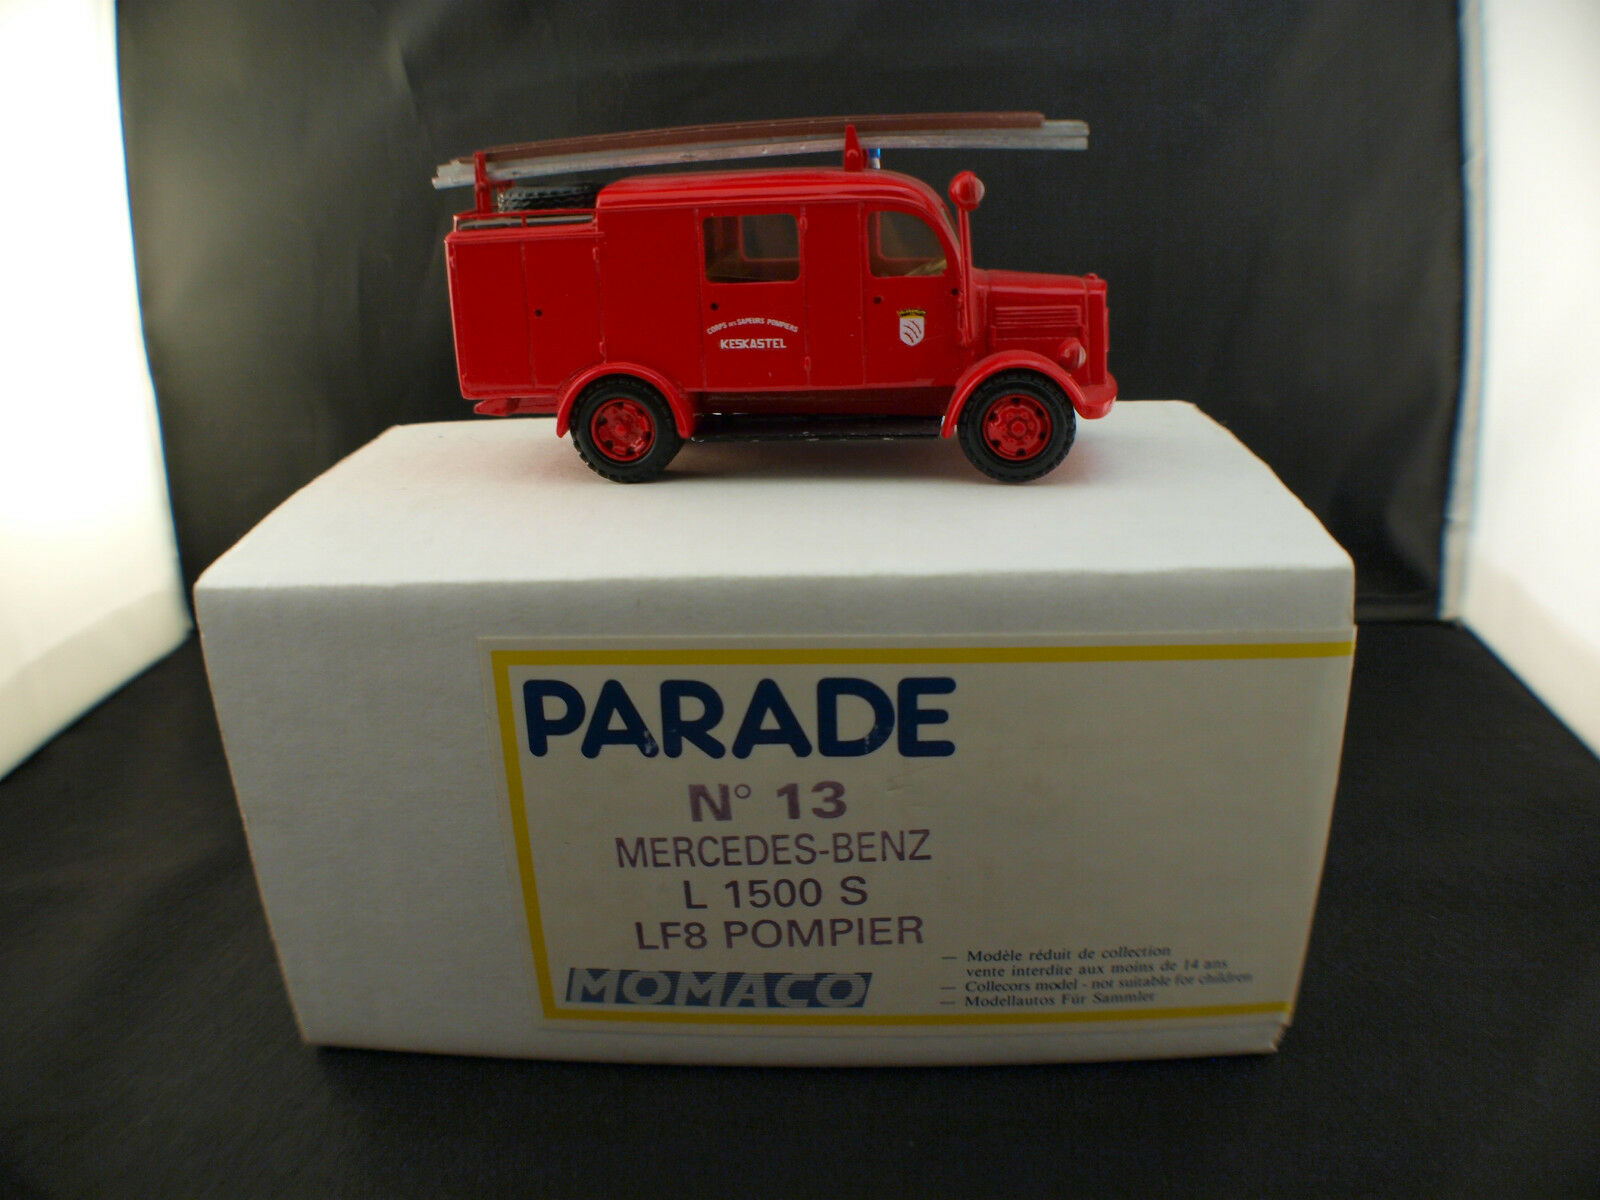 PARADE n°13 MERCEDES L1500S LF8 Fourgon pompiers Keskastel boite neuf 1 43